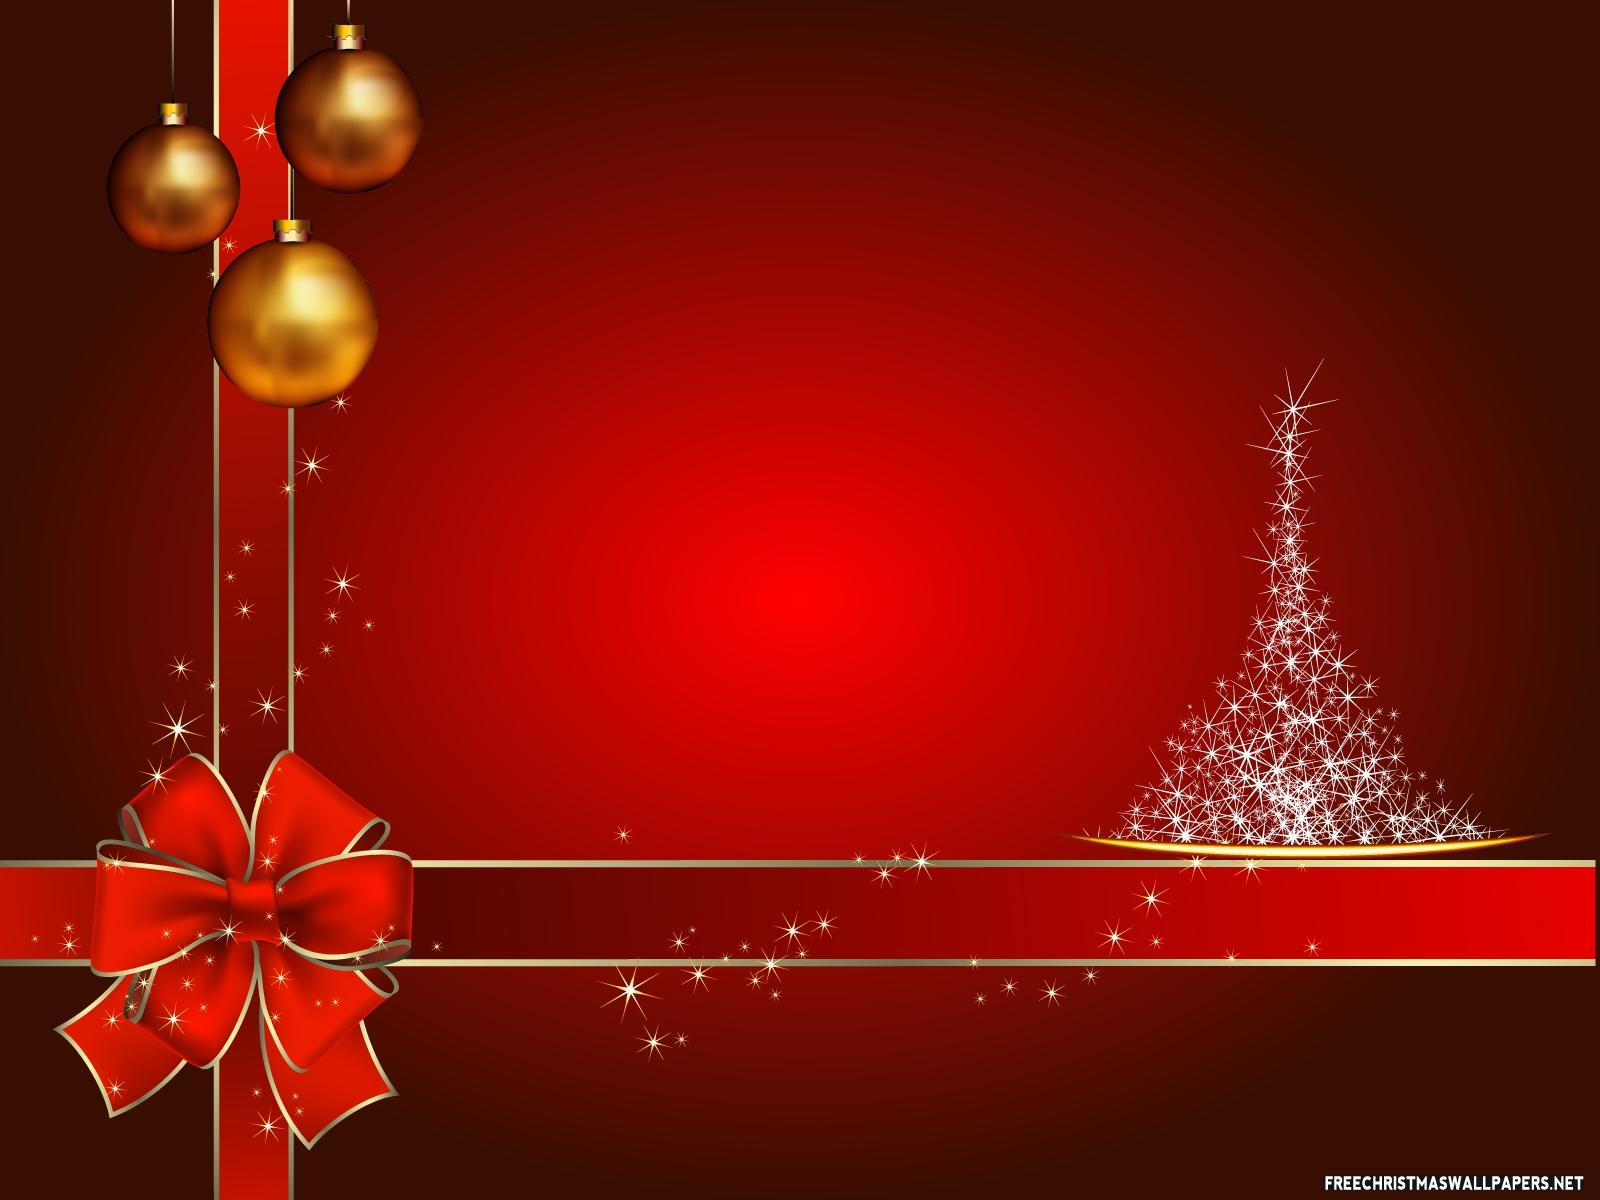 IRBOB SEVENFOLD: Christmas Gift Ideas wallpaper